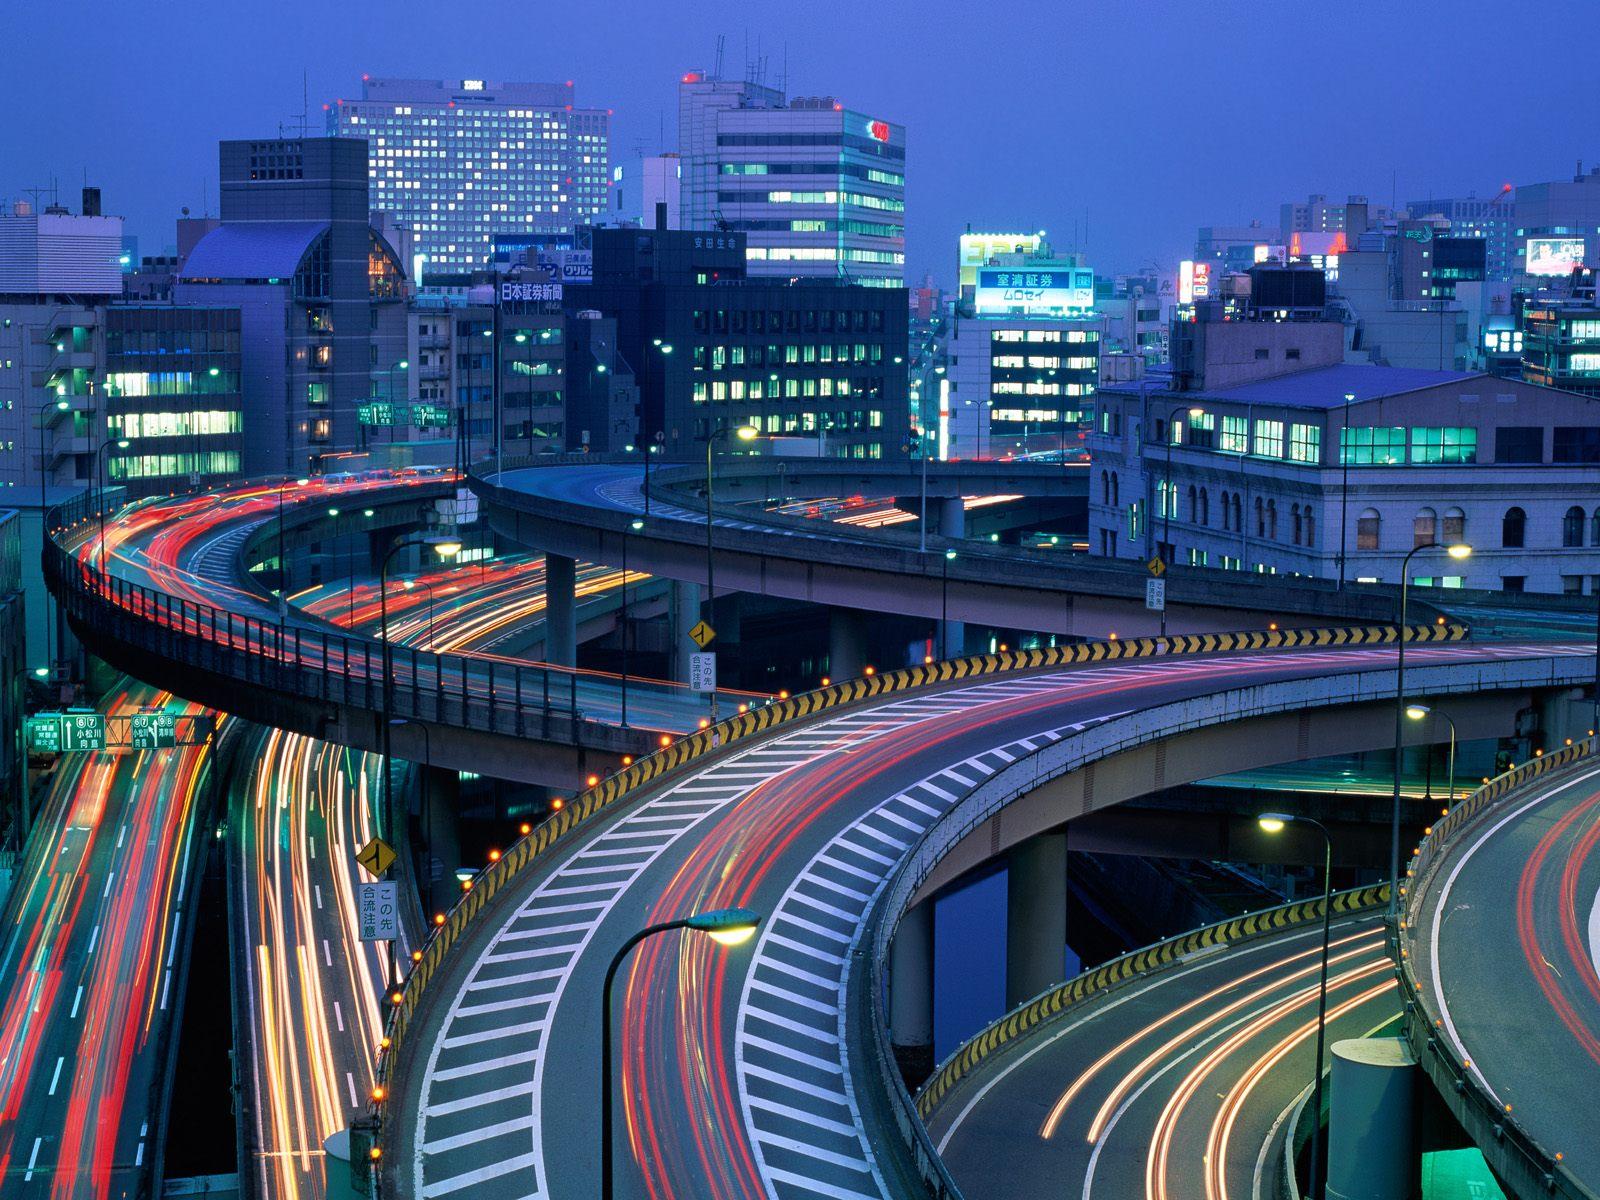 http://2.bp.blogspot.com/-nREuSitvgtQ/TfPOV1dhU9I/AAAAAAAAEAU/Sse-3Nta5JM/s1600/japan-wallpapers-13.jpg